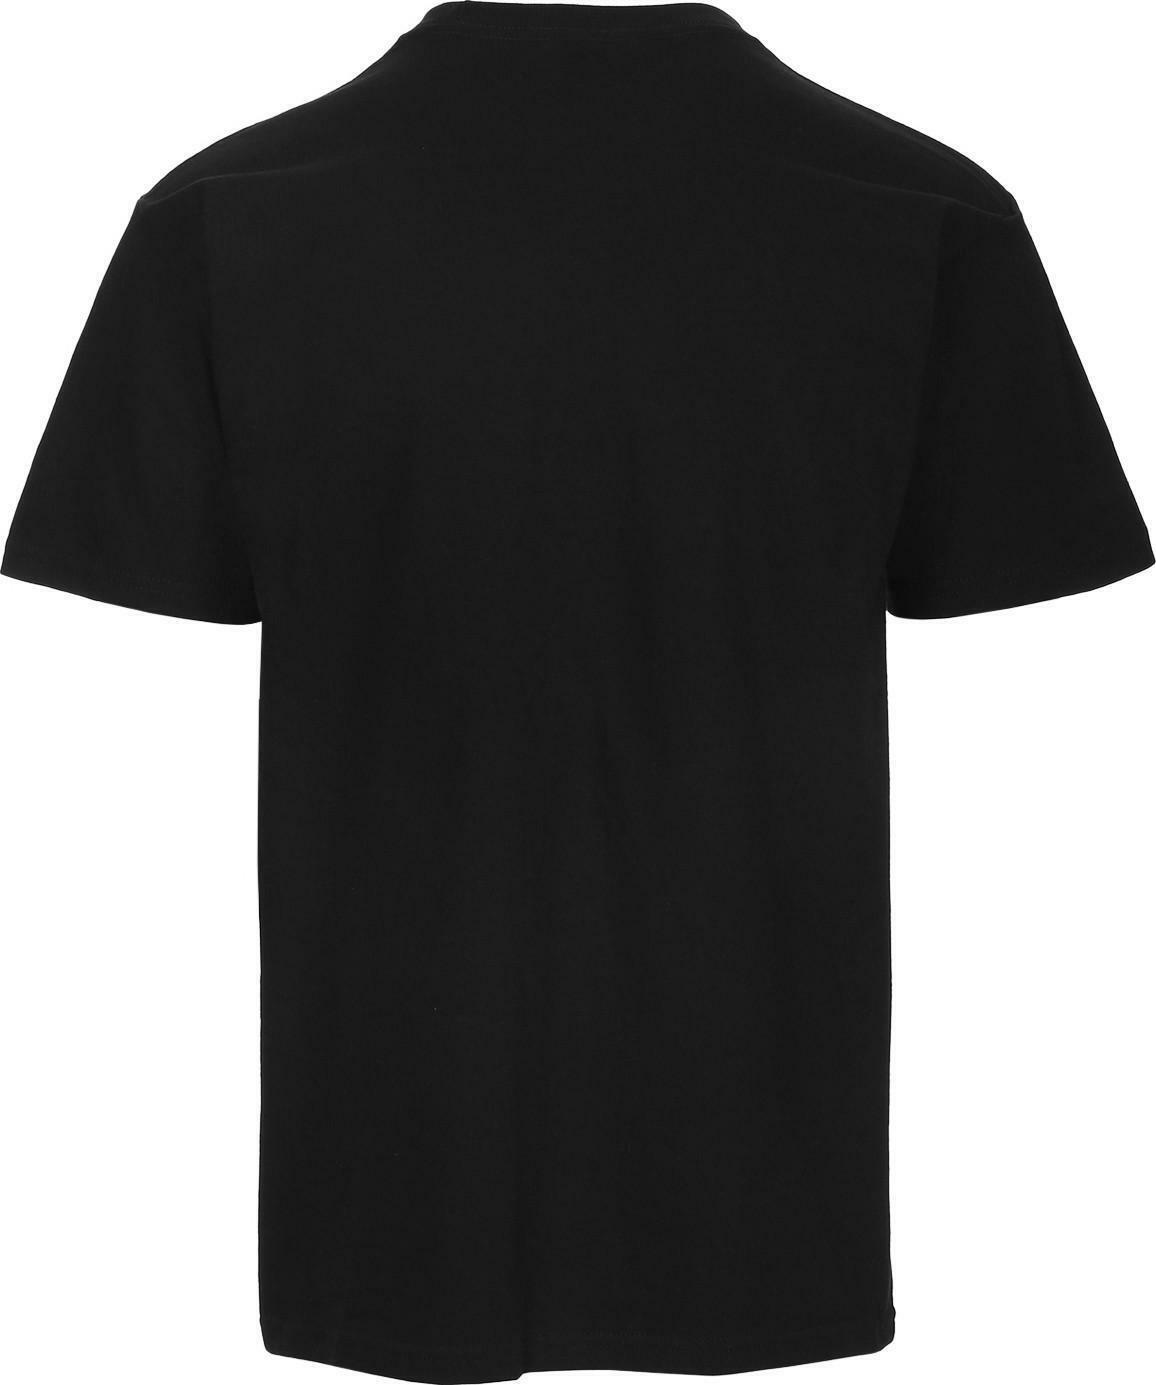 obey obey no cuffs t-shirt uomo nera 221180183